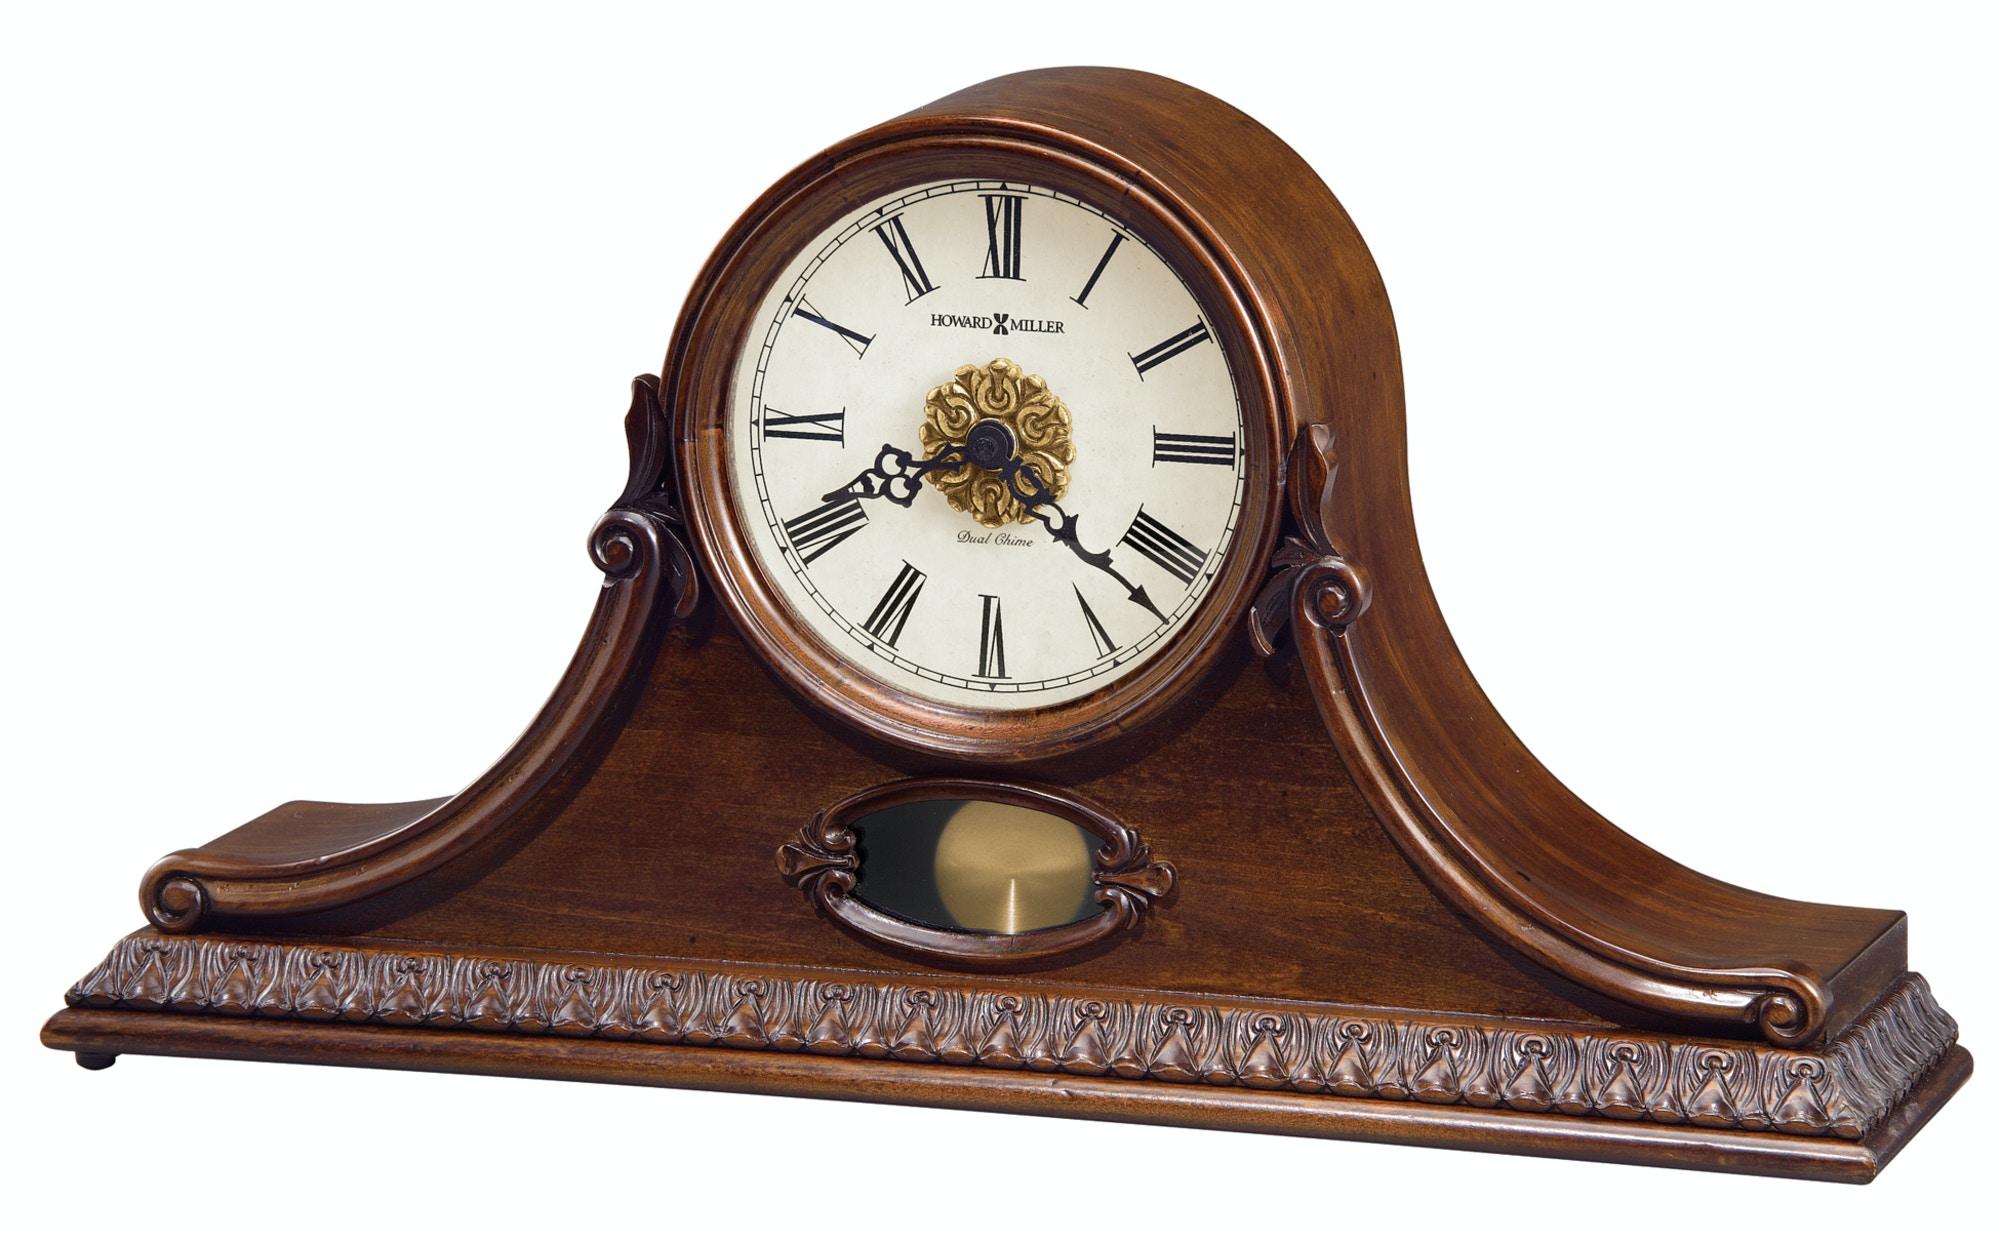 Superieur Howard Miller Andrea 81St AnnIVersary Mantel Clock 635 144